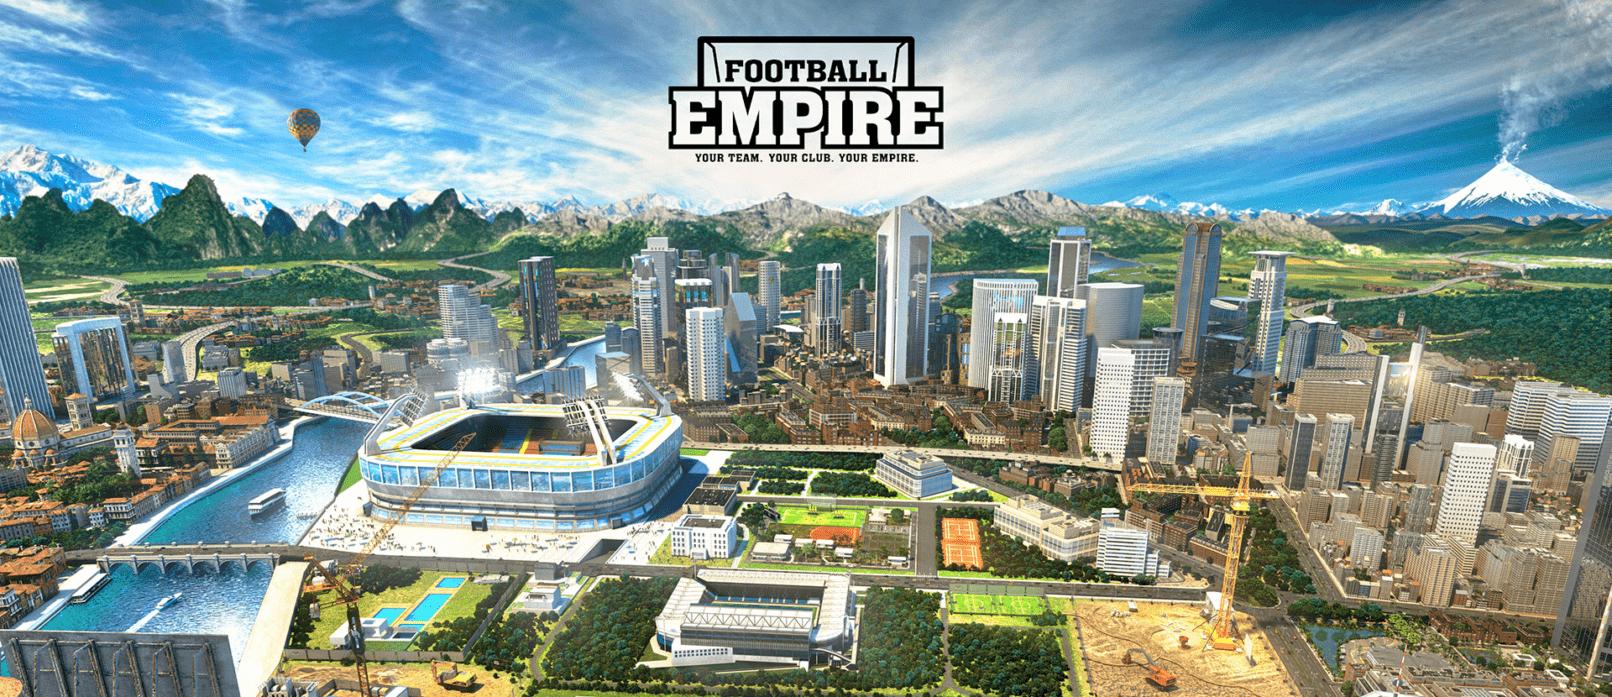 Football Empire mobile game Hero Shot